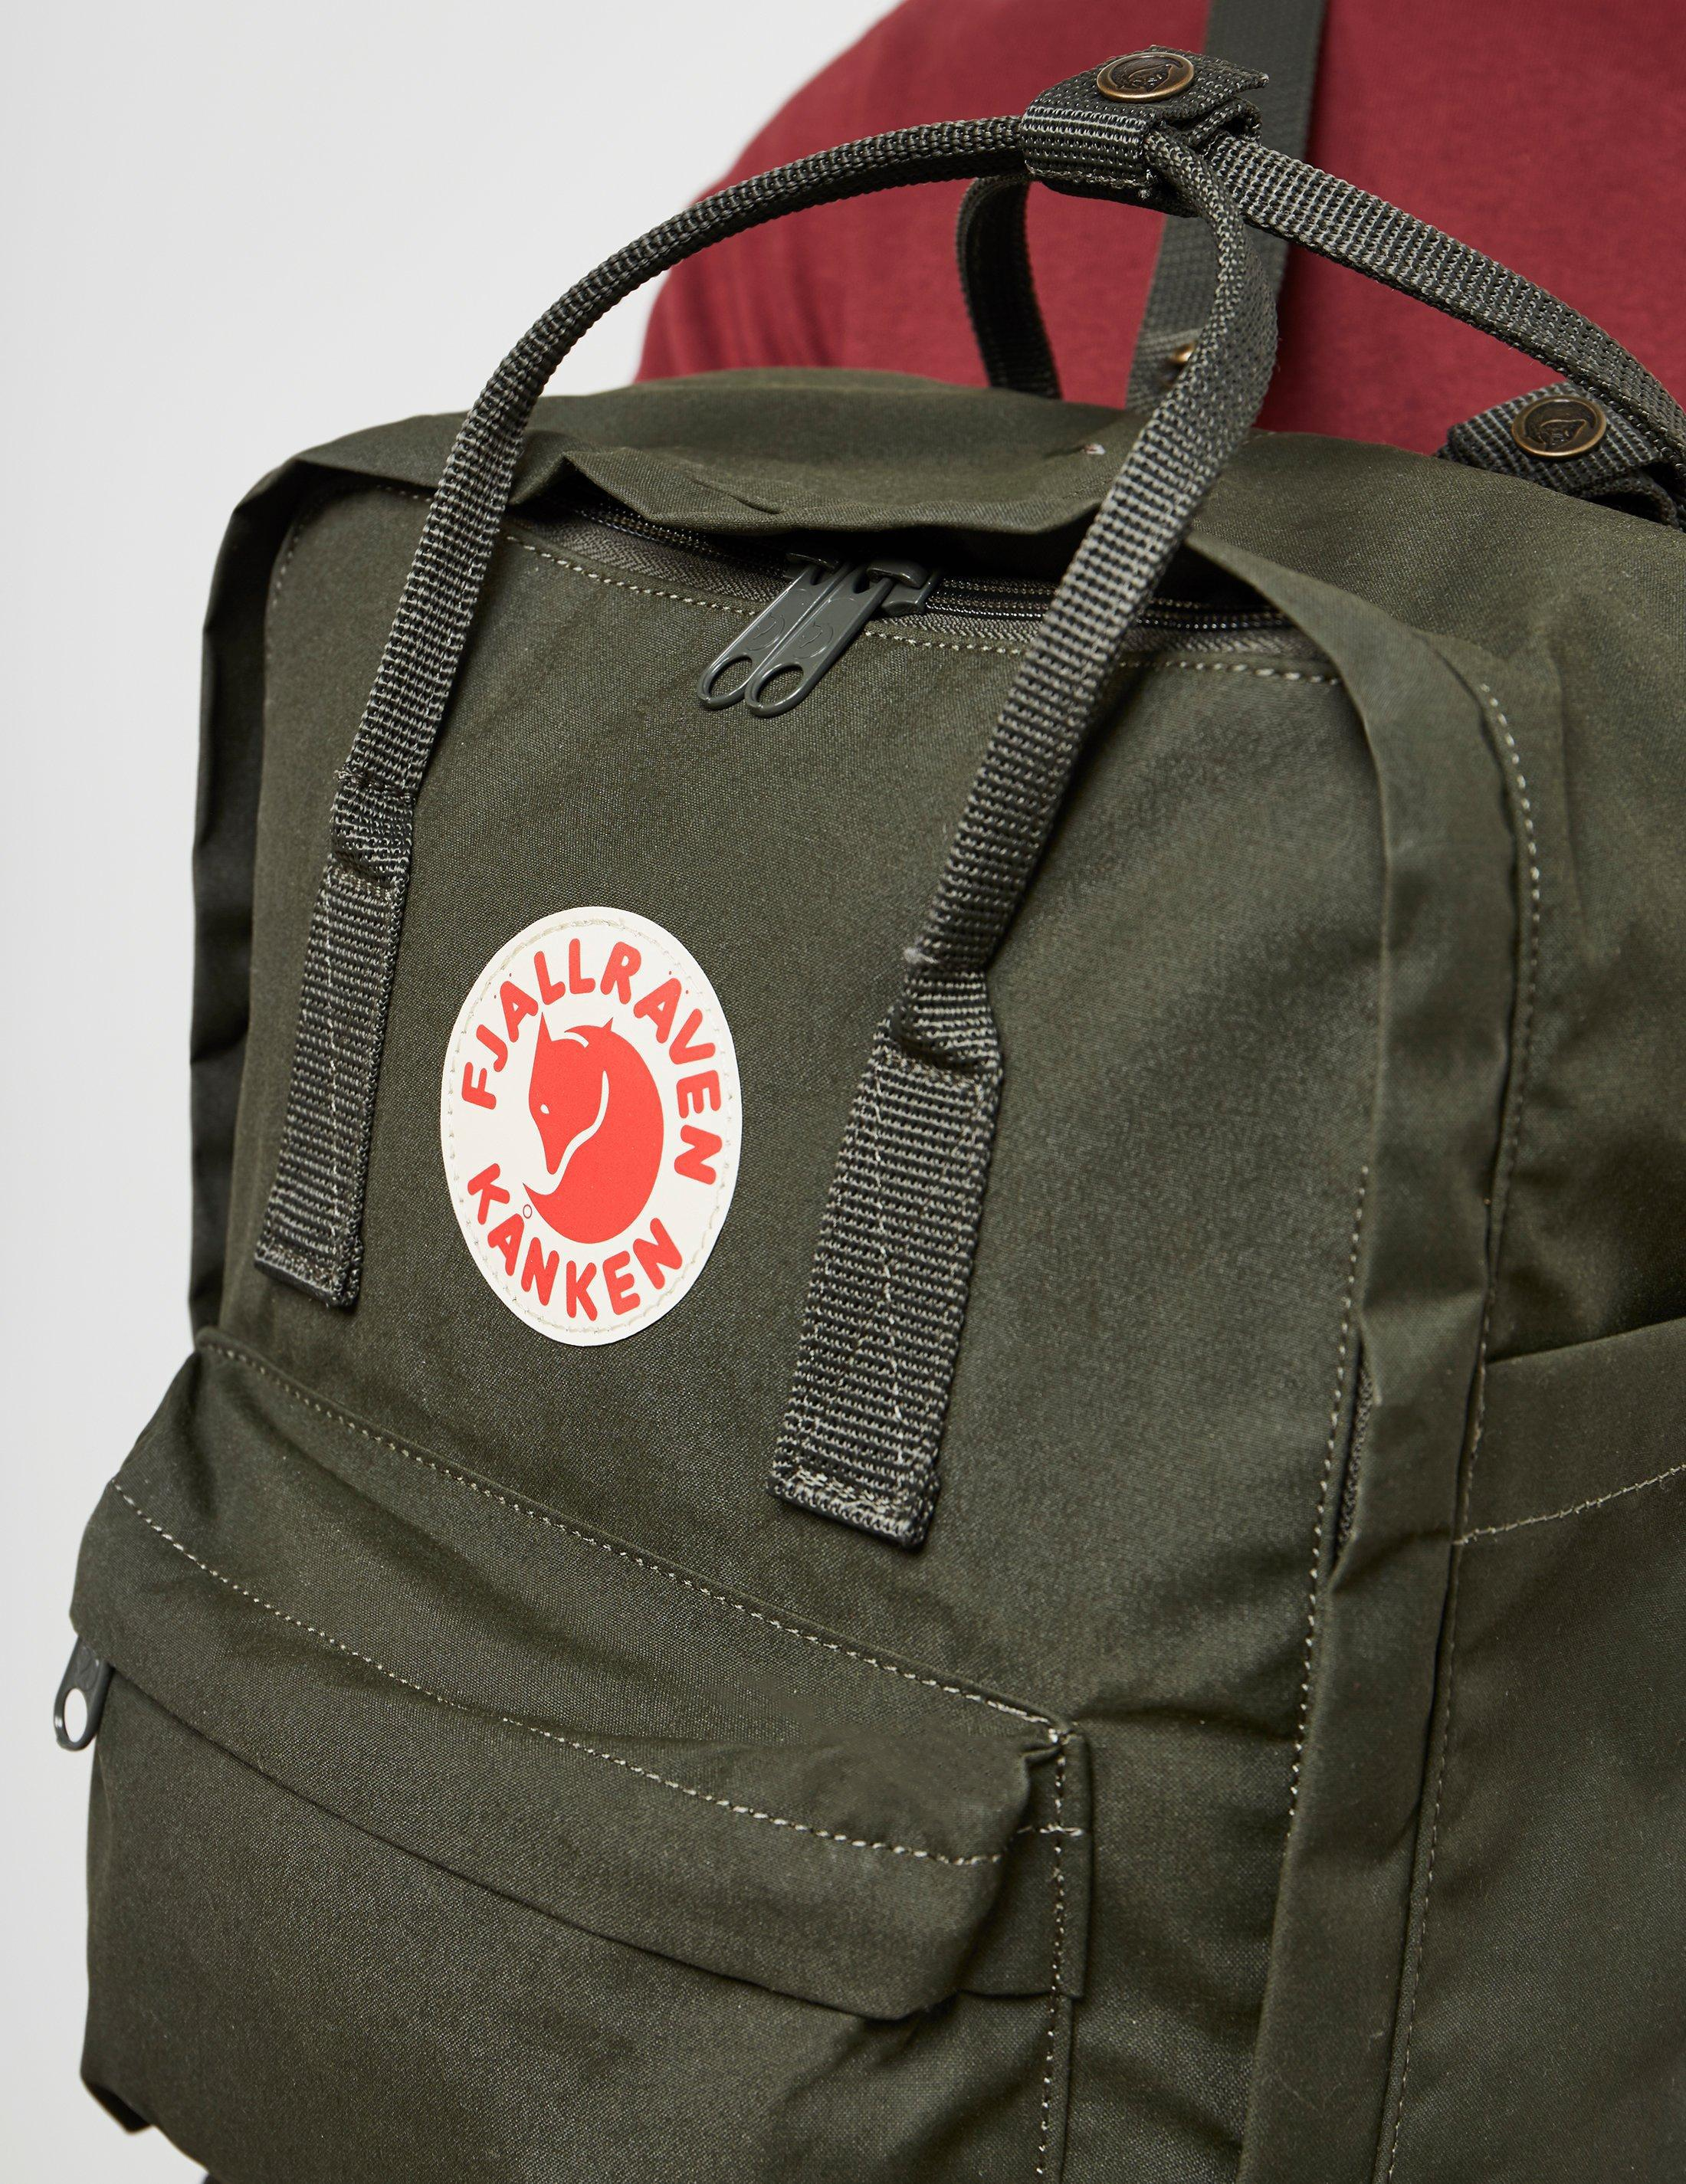 Lyst - Fjallraven Womens Kanken Backpack Green in Green fc05ff06d4